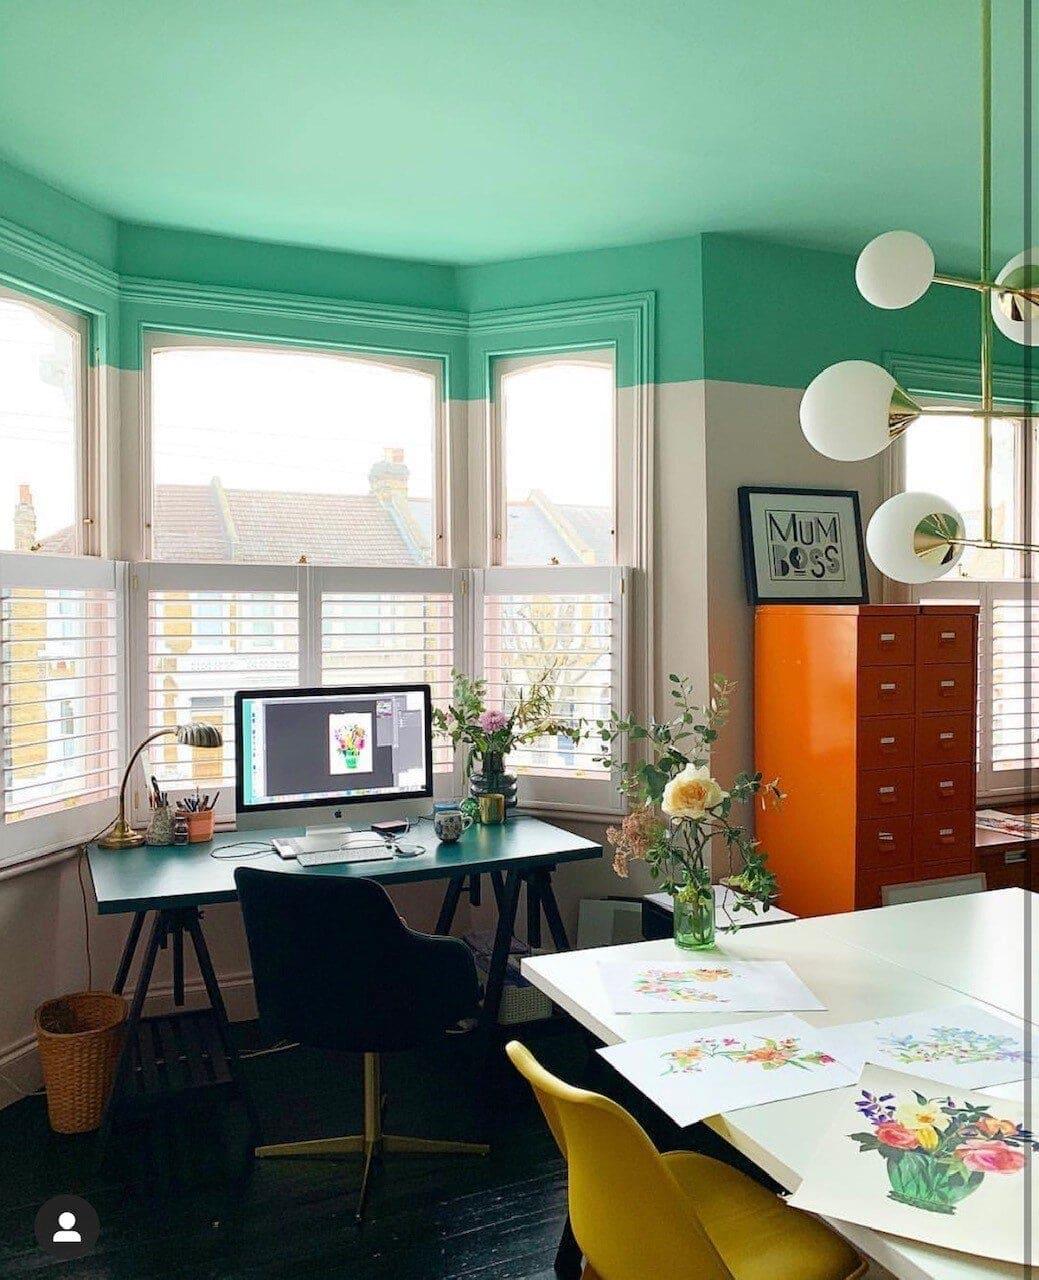 interior decor, interiors, interior design, design, ceiling, fifth wall, decorators, home decor, home design, decor , decor ideas